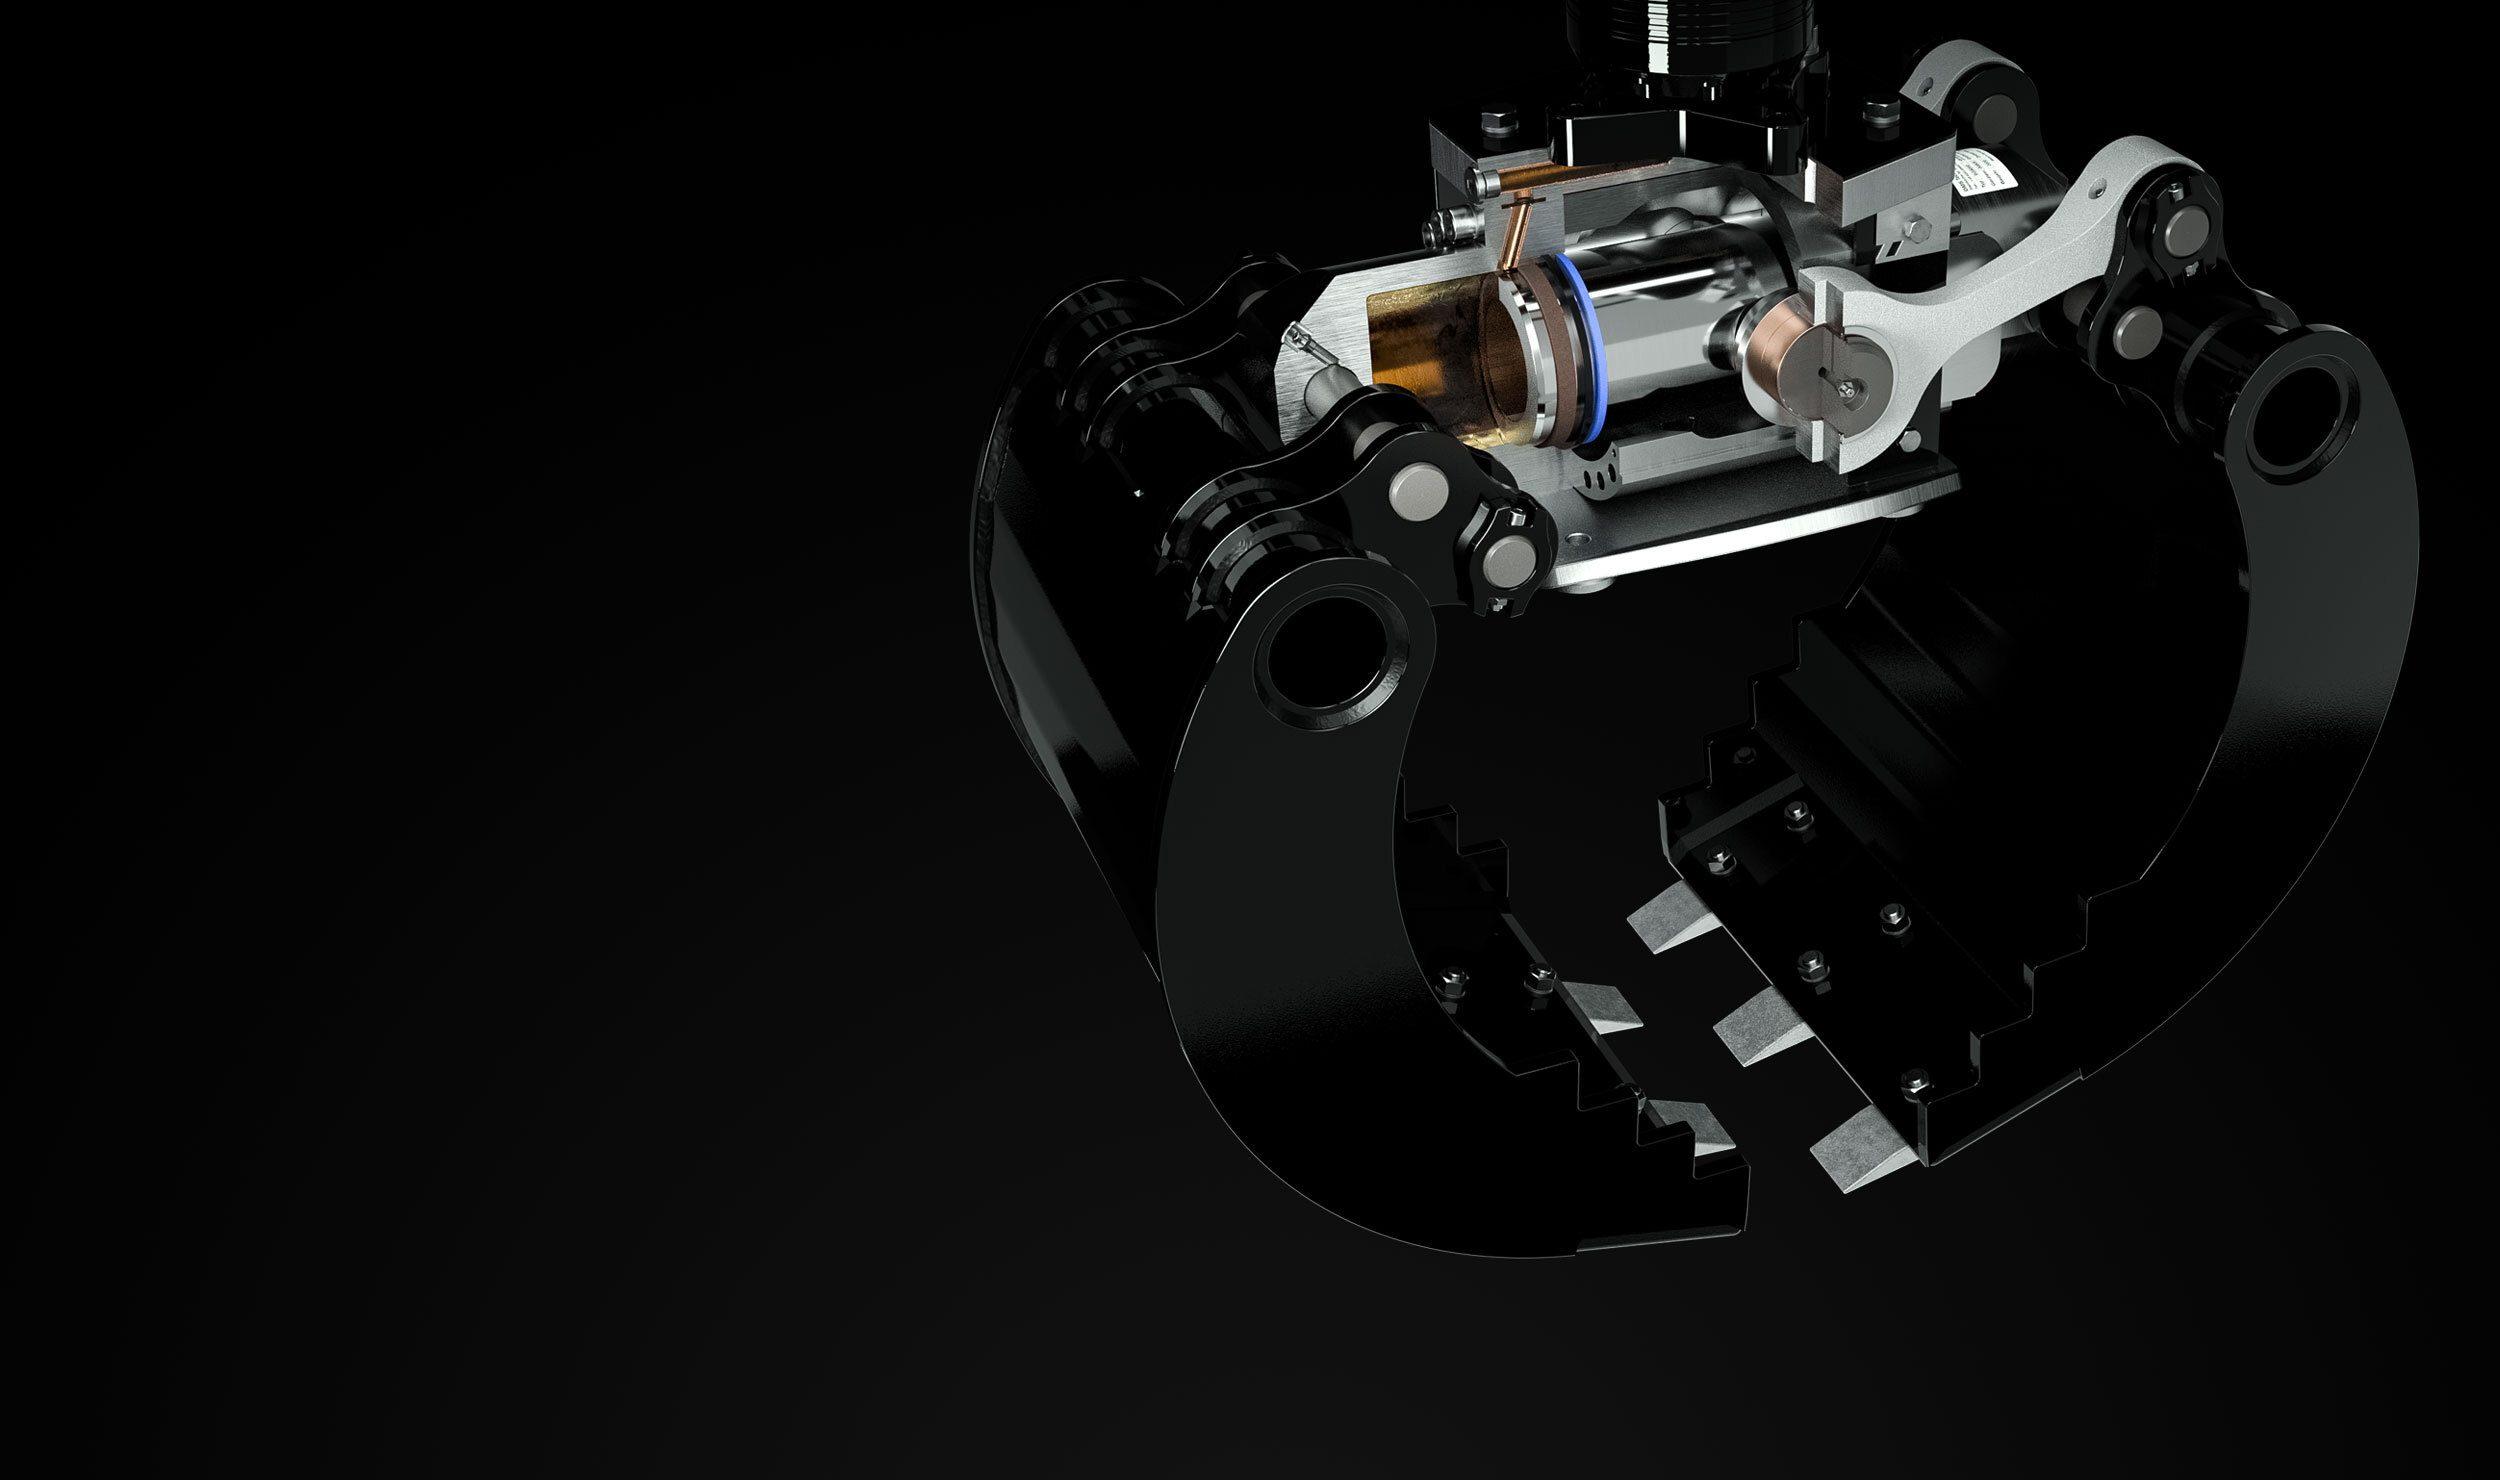 sortiergreifer-produkvorteile-hydarulikzylinder-dms-technologie